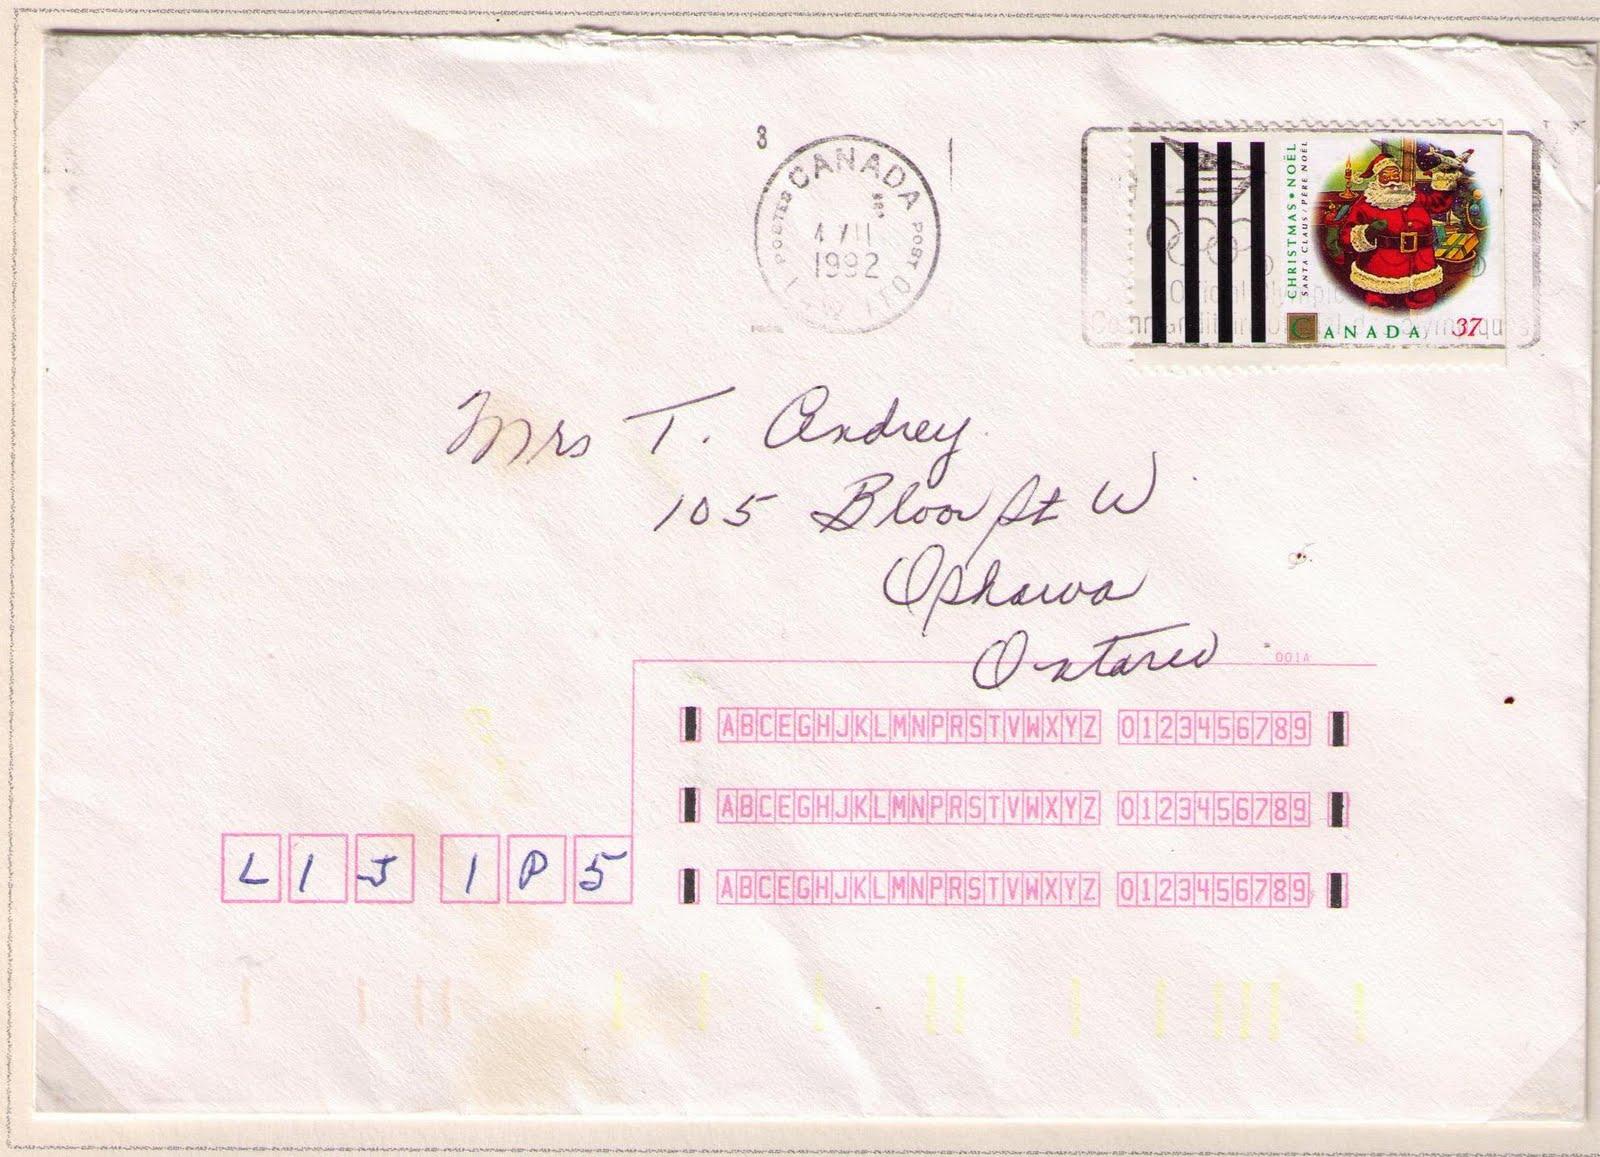 Postal history corner toronto south central processing plant l4w 1t0 to ottawa december 4 1992 spiritdancerdesigns Choice Image